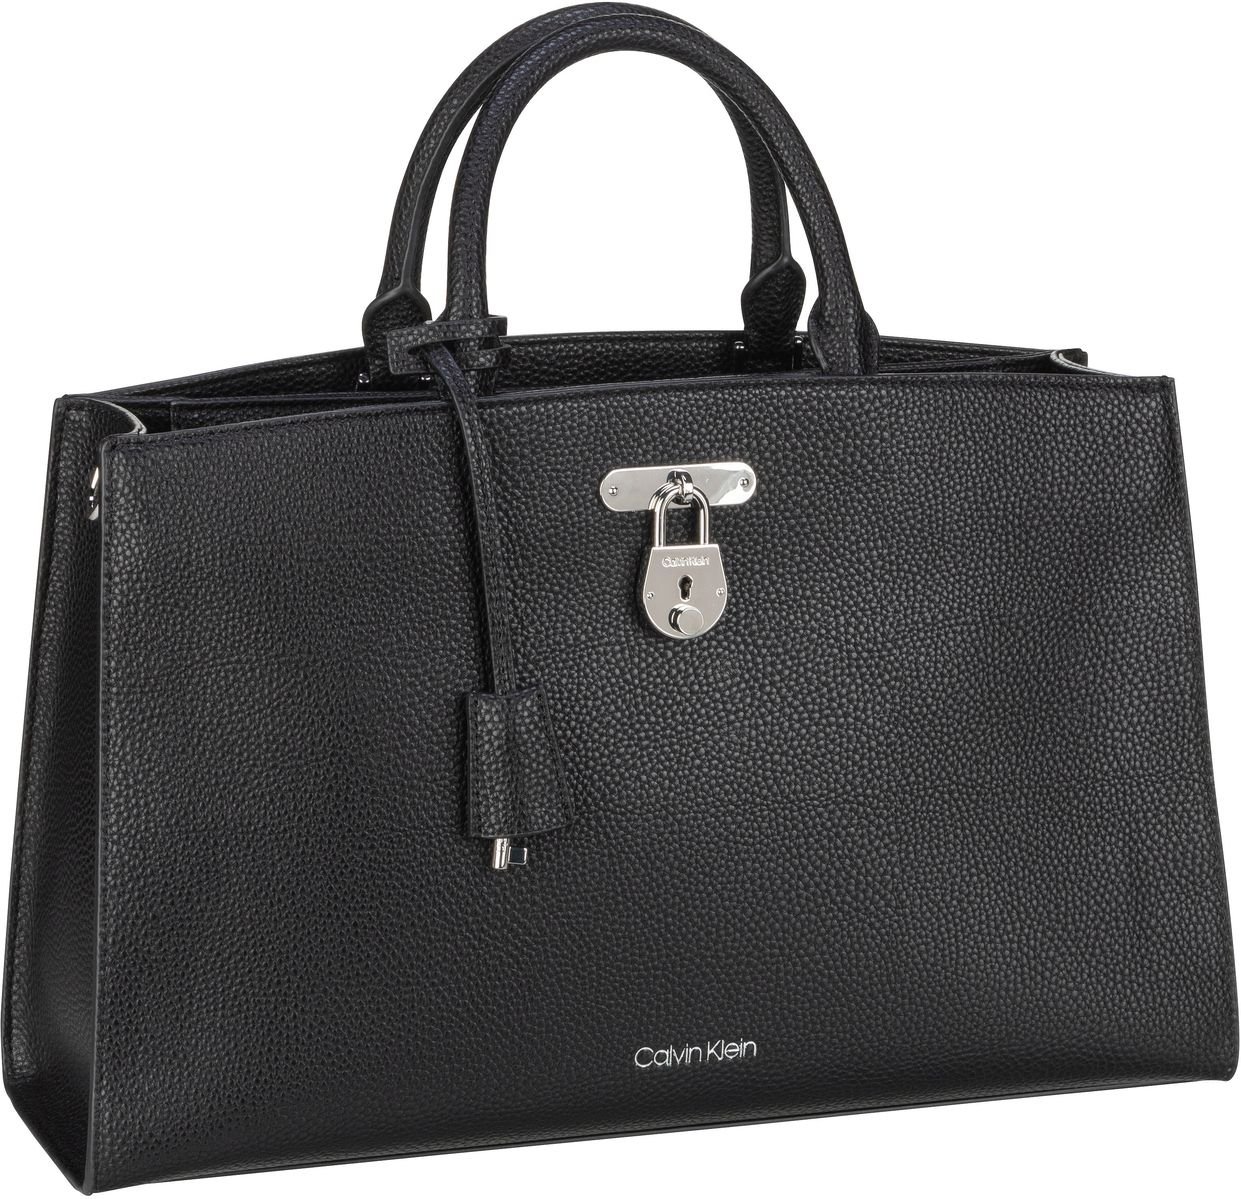 Handtasche Dressed Business Tote LG PF20 Black